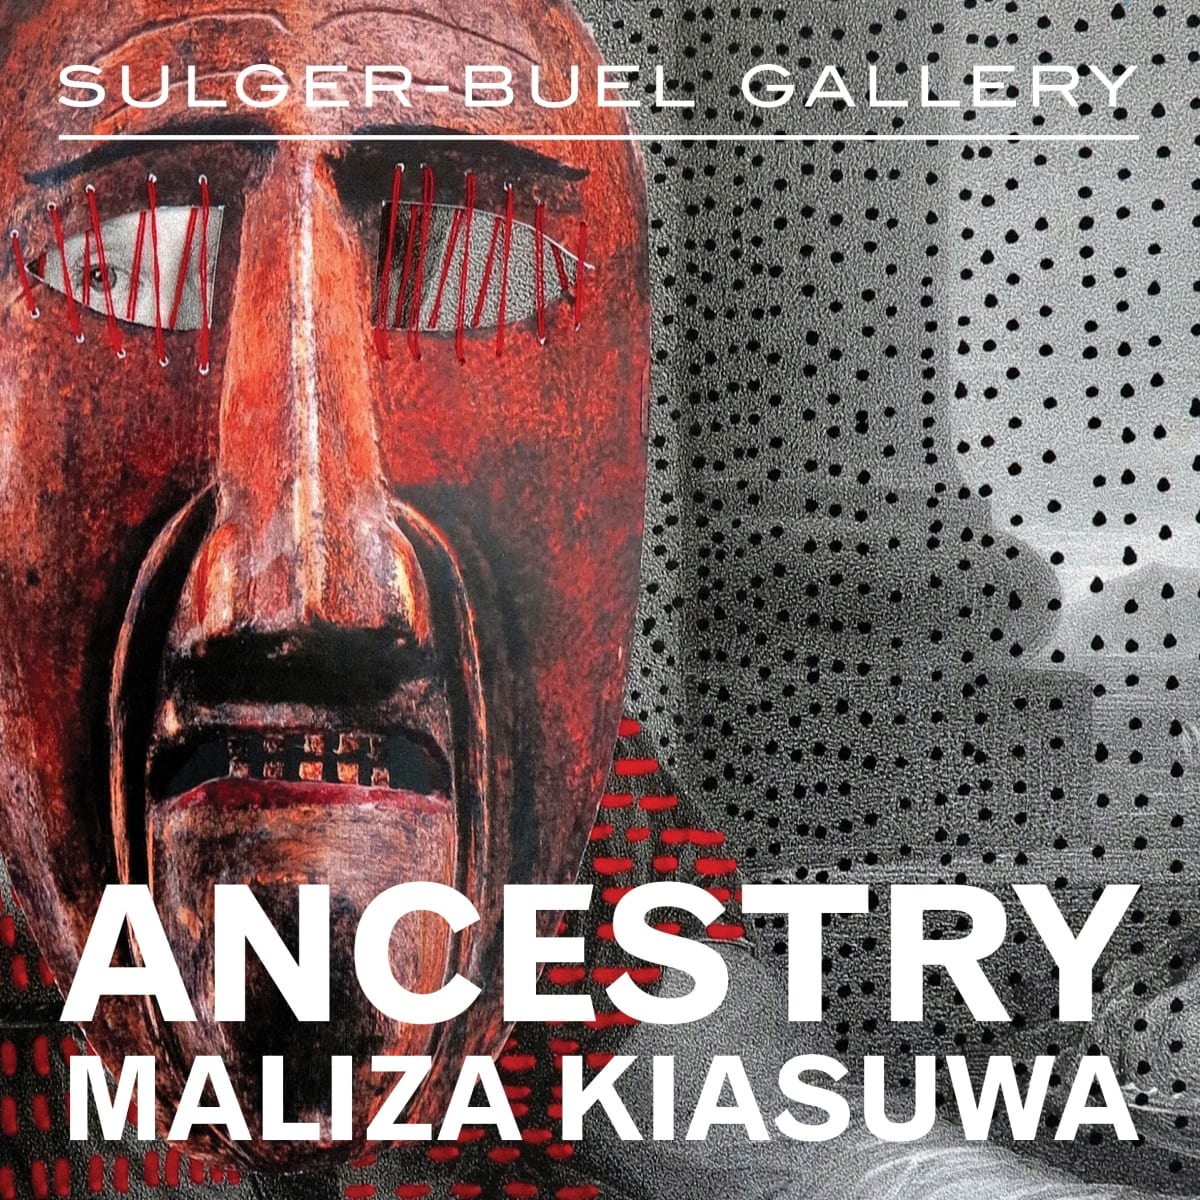 Ancestry (online exhibition)